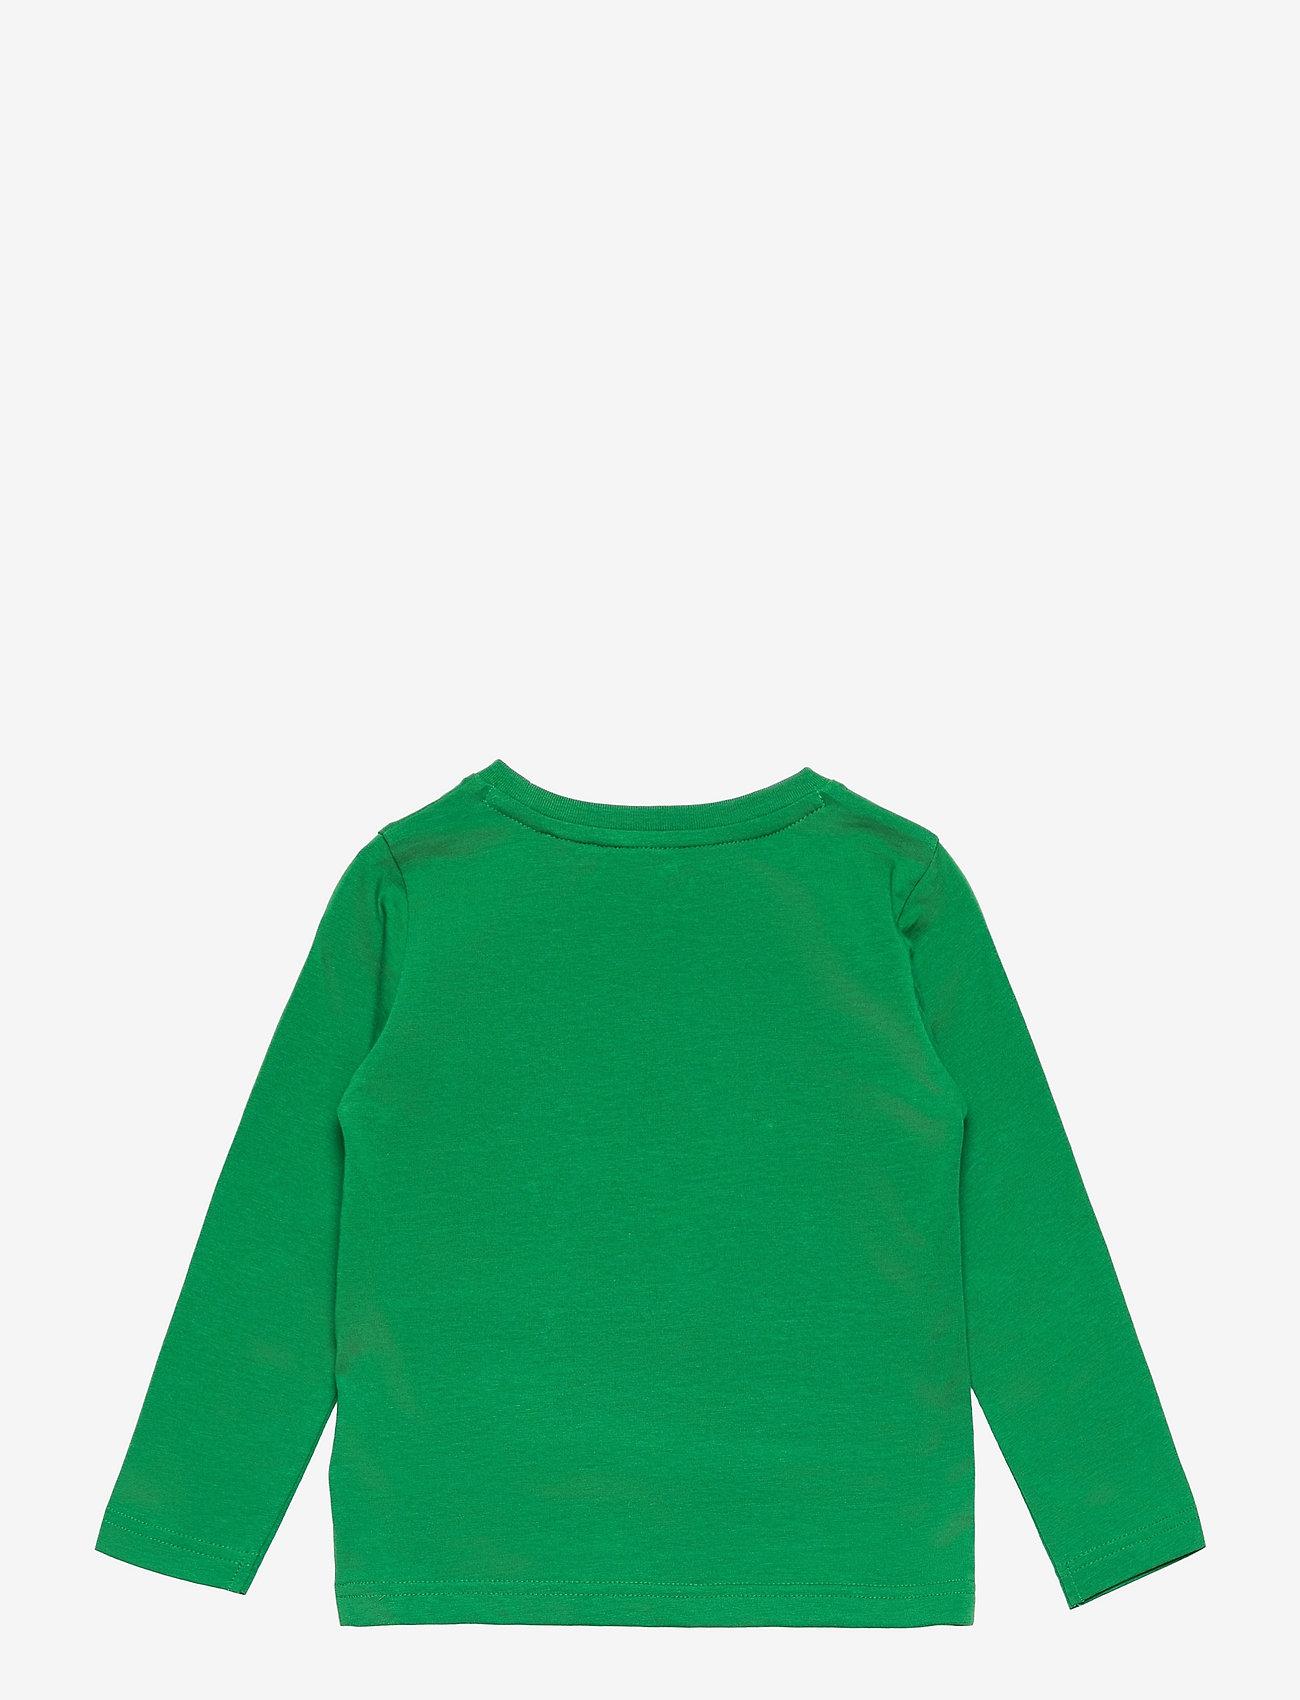 GANT - ARCHIVE SHIELD LS T-SHIRT - long-sleeved - lavish green - 1